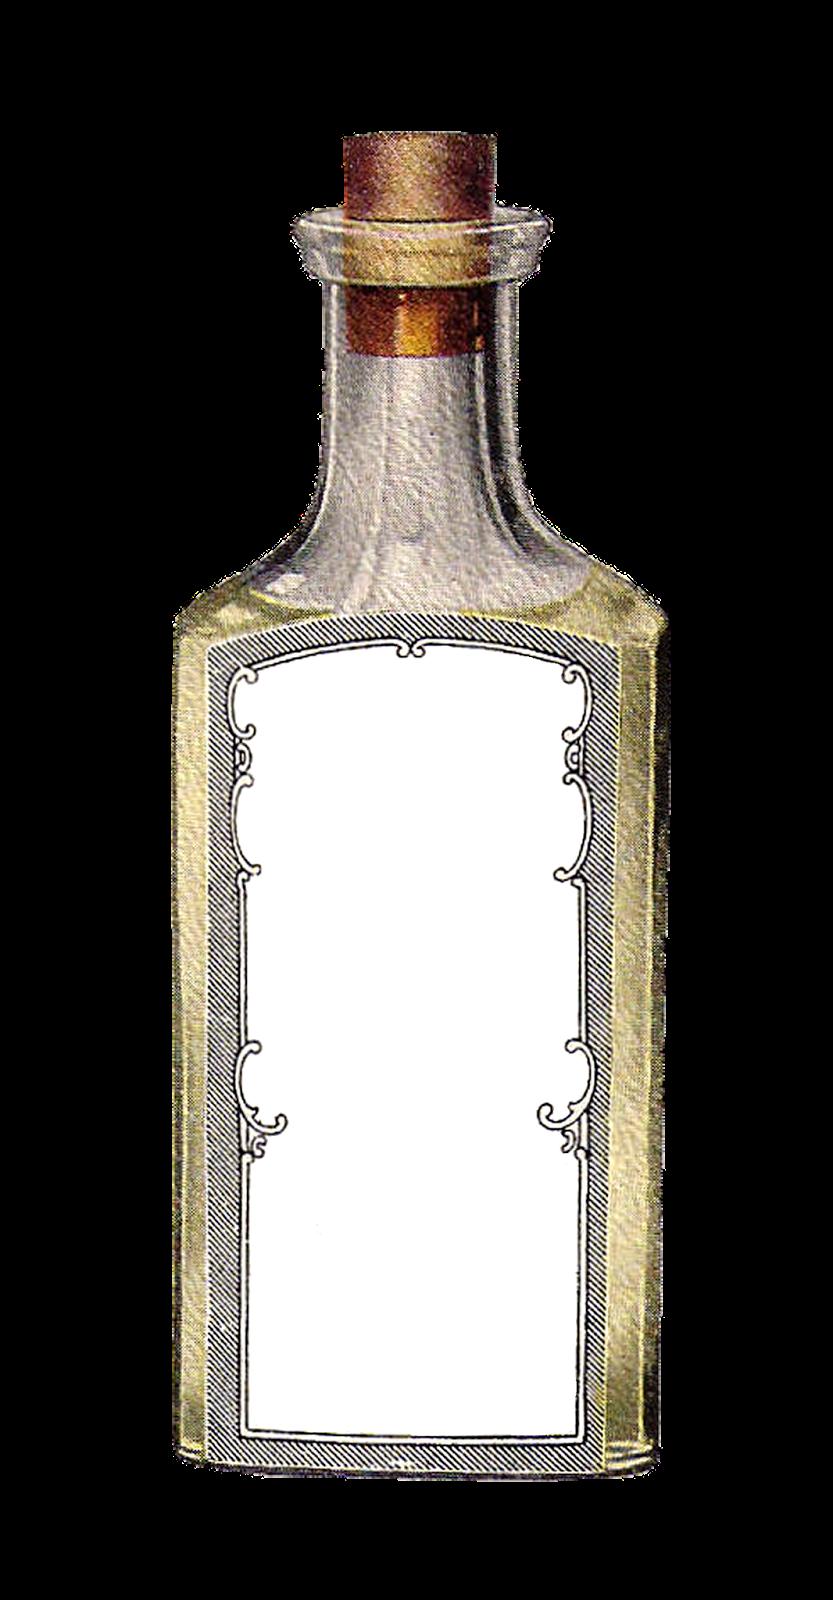 Antique Images: Free Blank Digital Gift Tag Label Designs ...